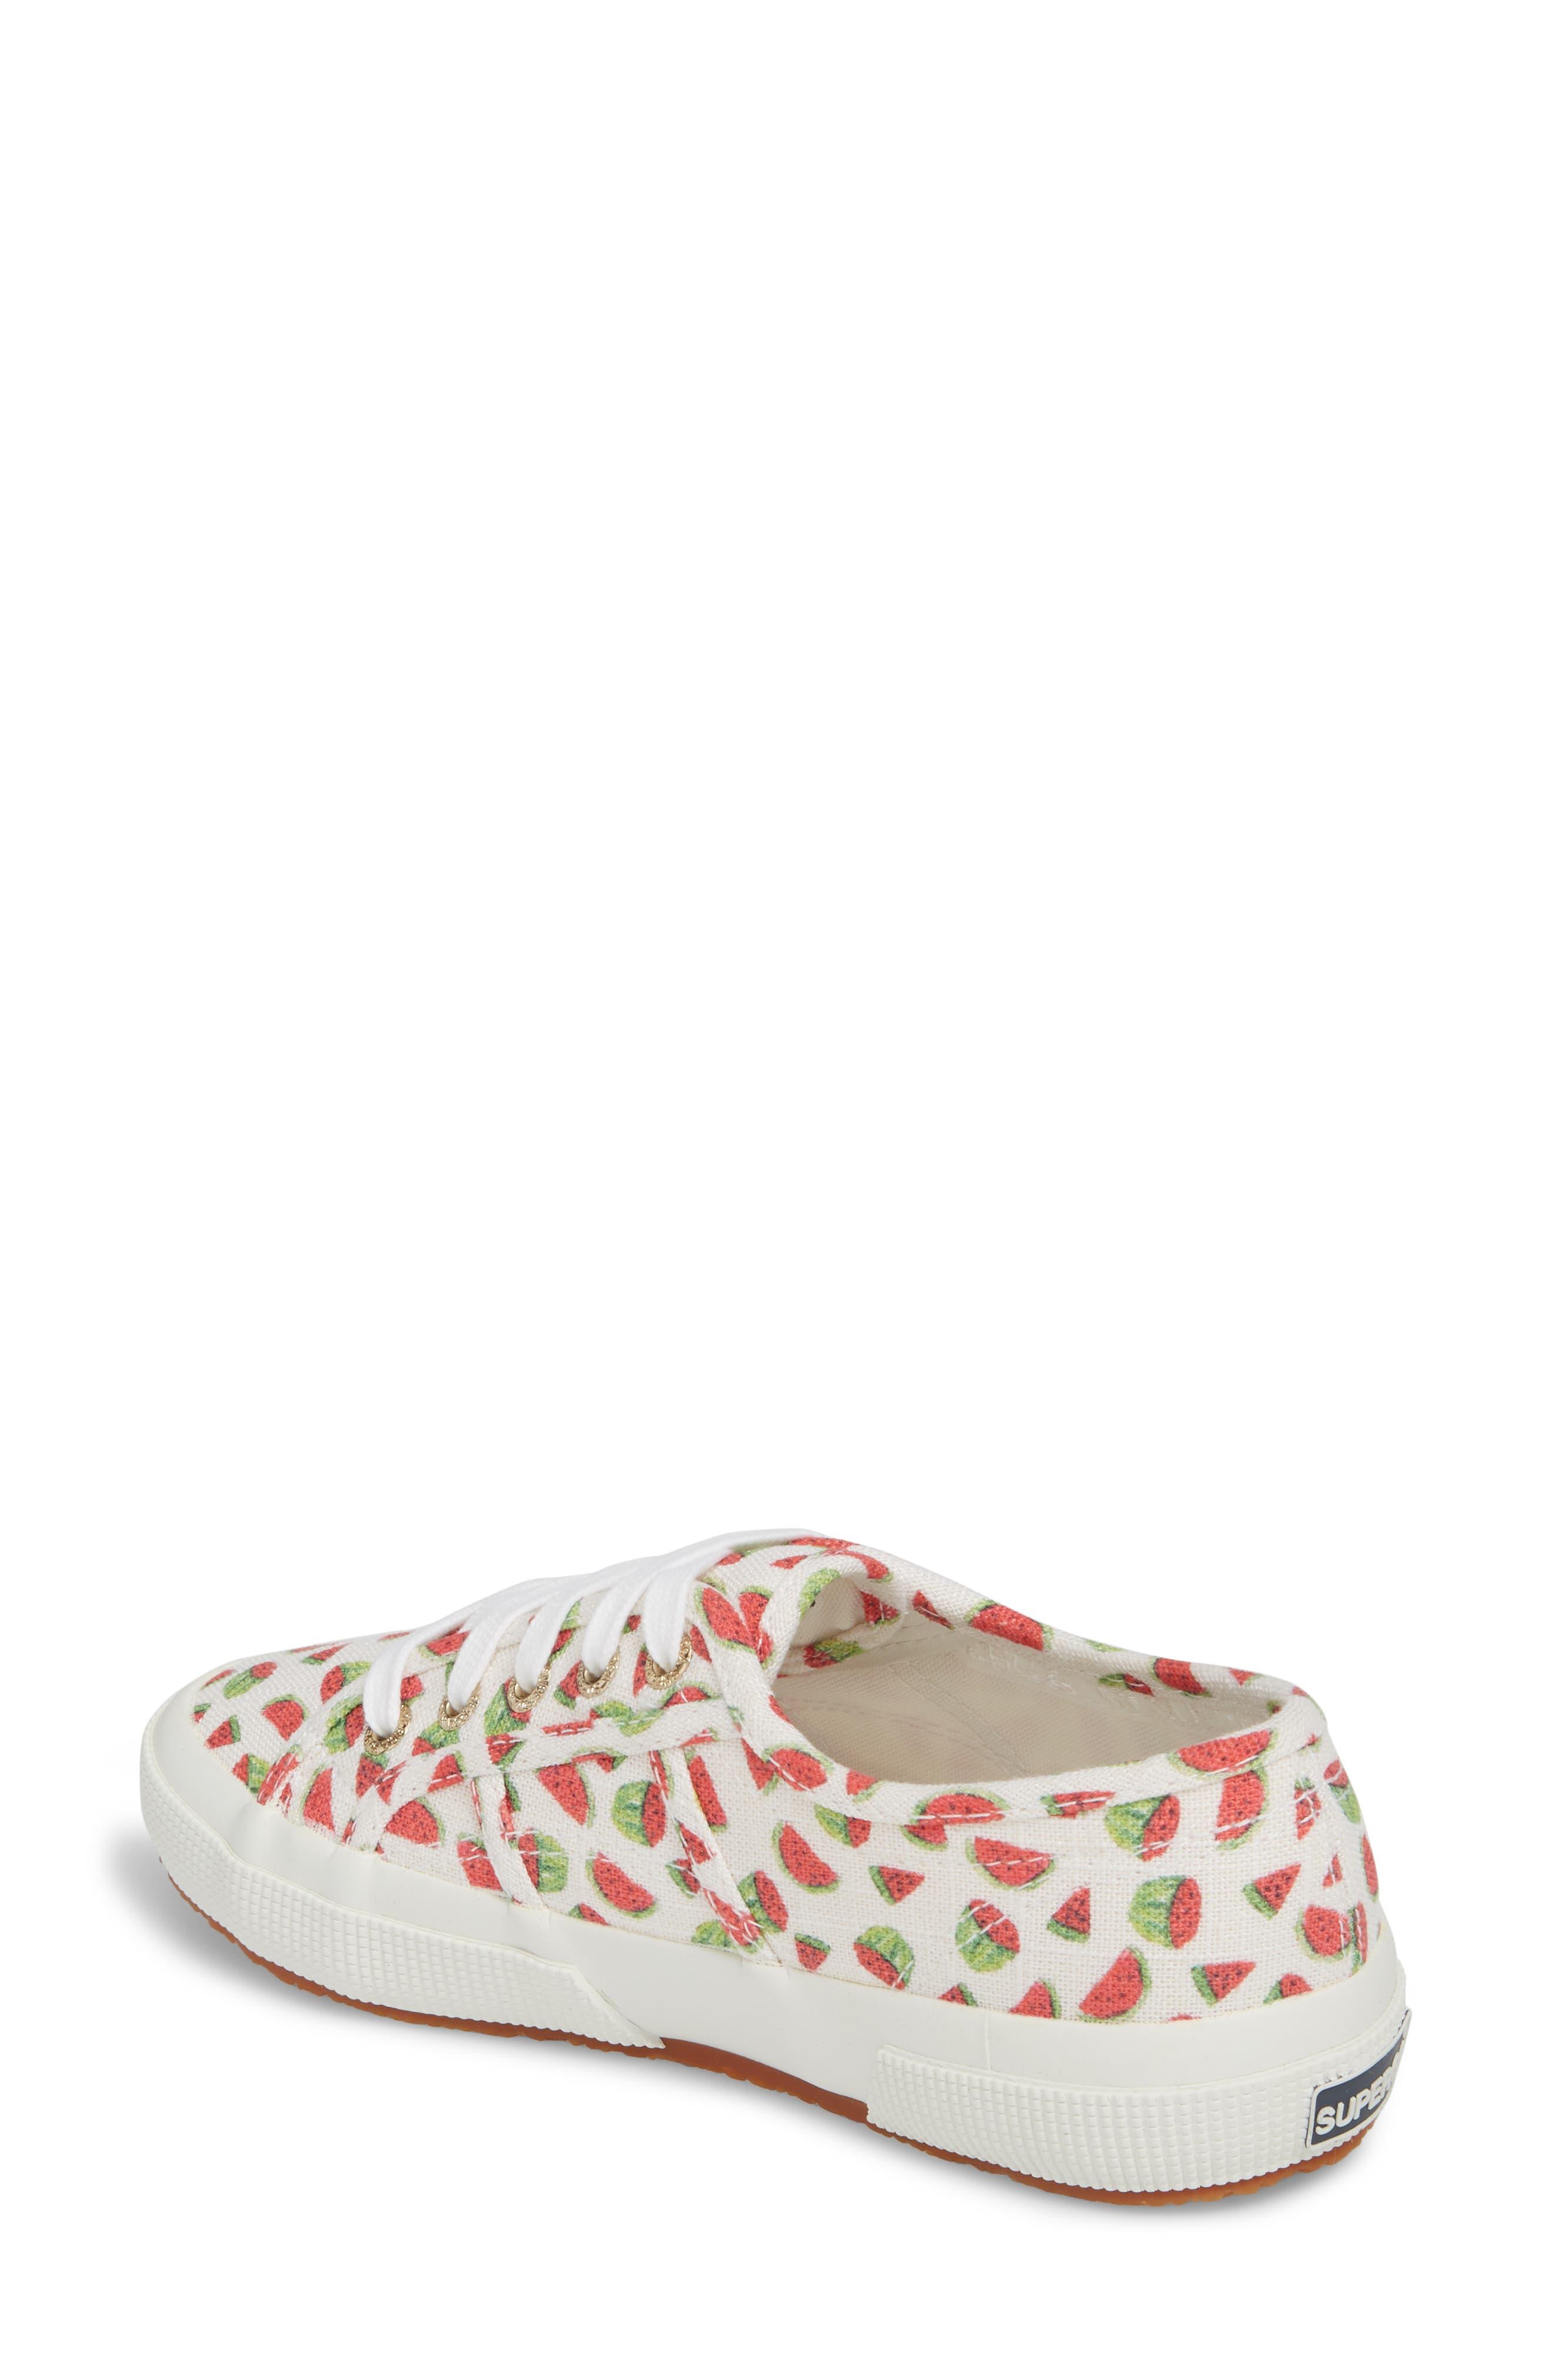 2750 Linenfruit Low Top Sneaker,                             Alternate thumbnail 2, color,                             600